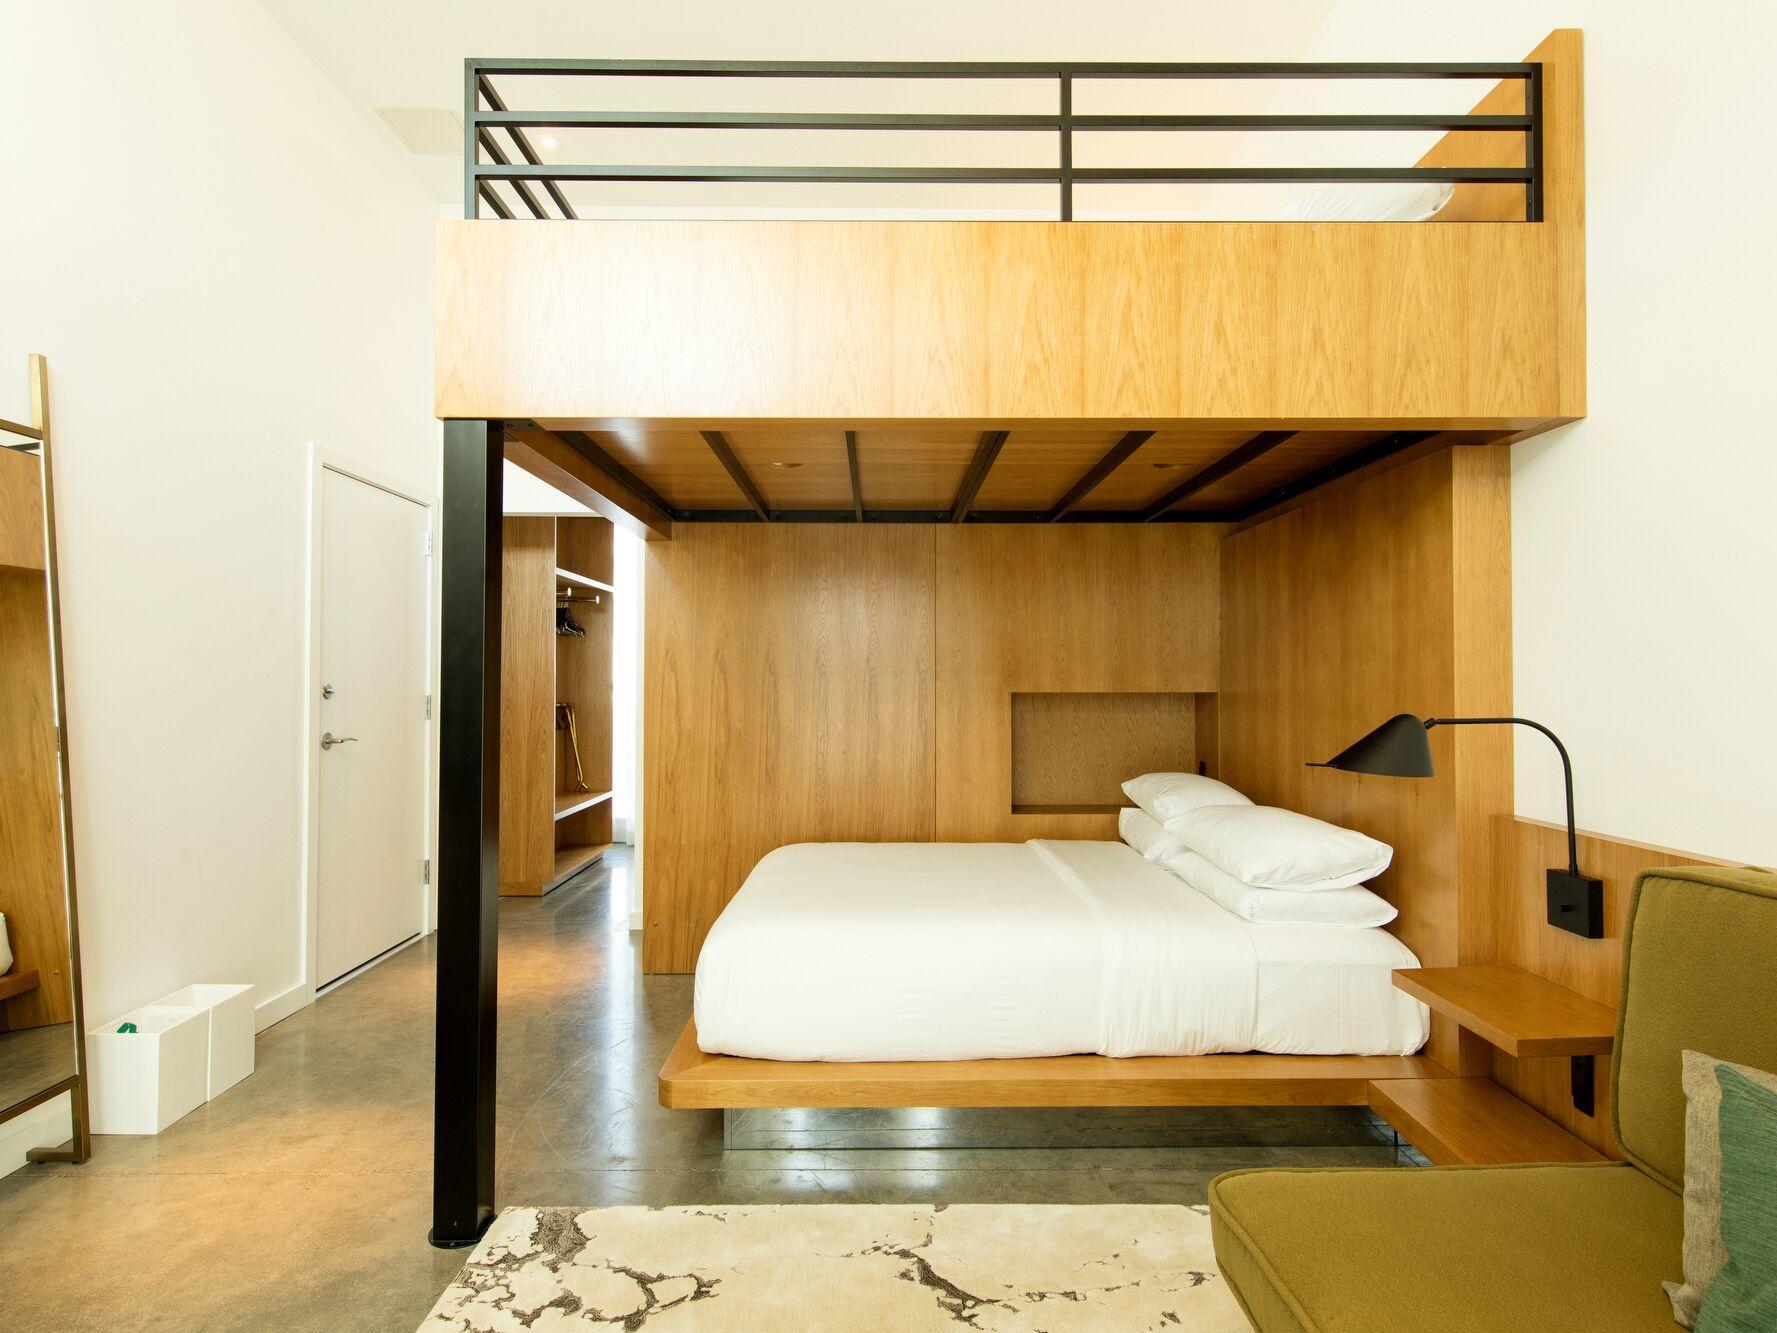 Sensational Downtown Sarasota Rooms Suites The Sarasota Modern Theyellowbook Wood Chair Design Ideas Theyellowbookinfo